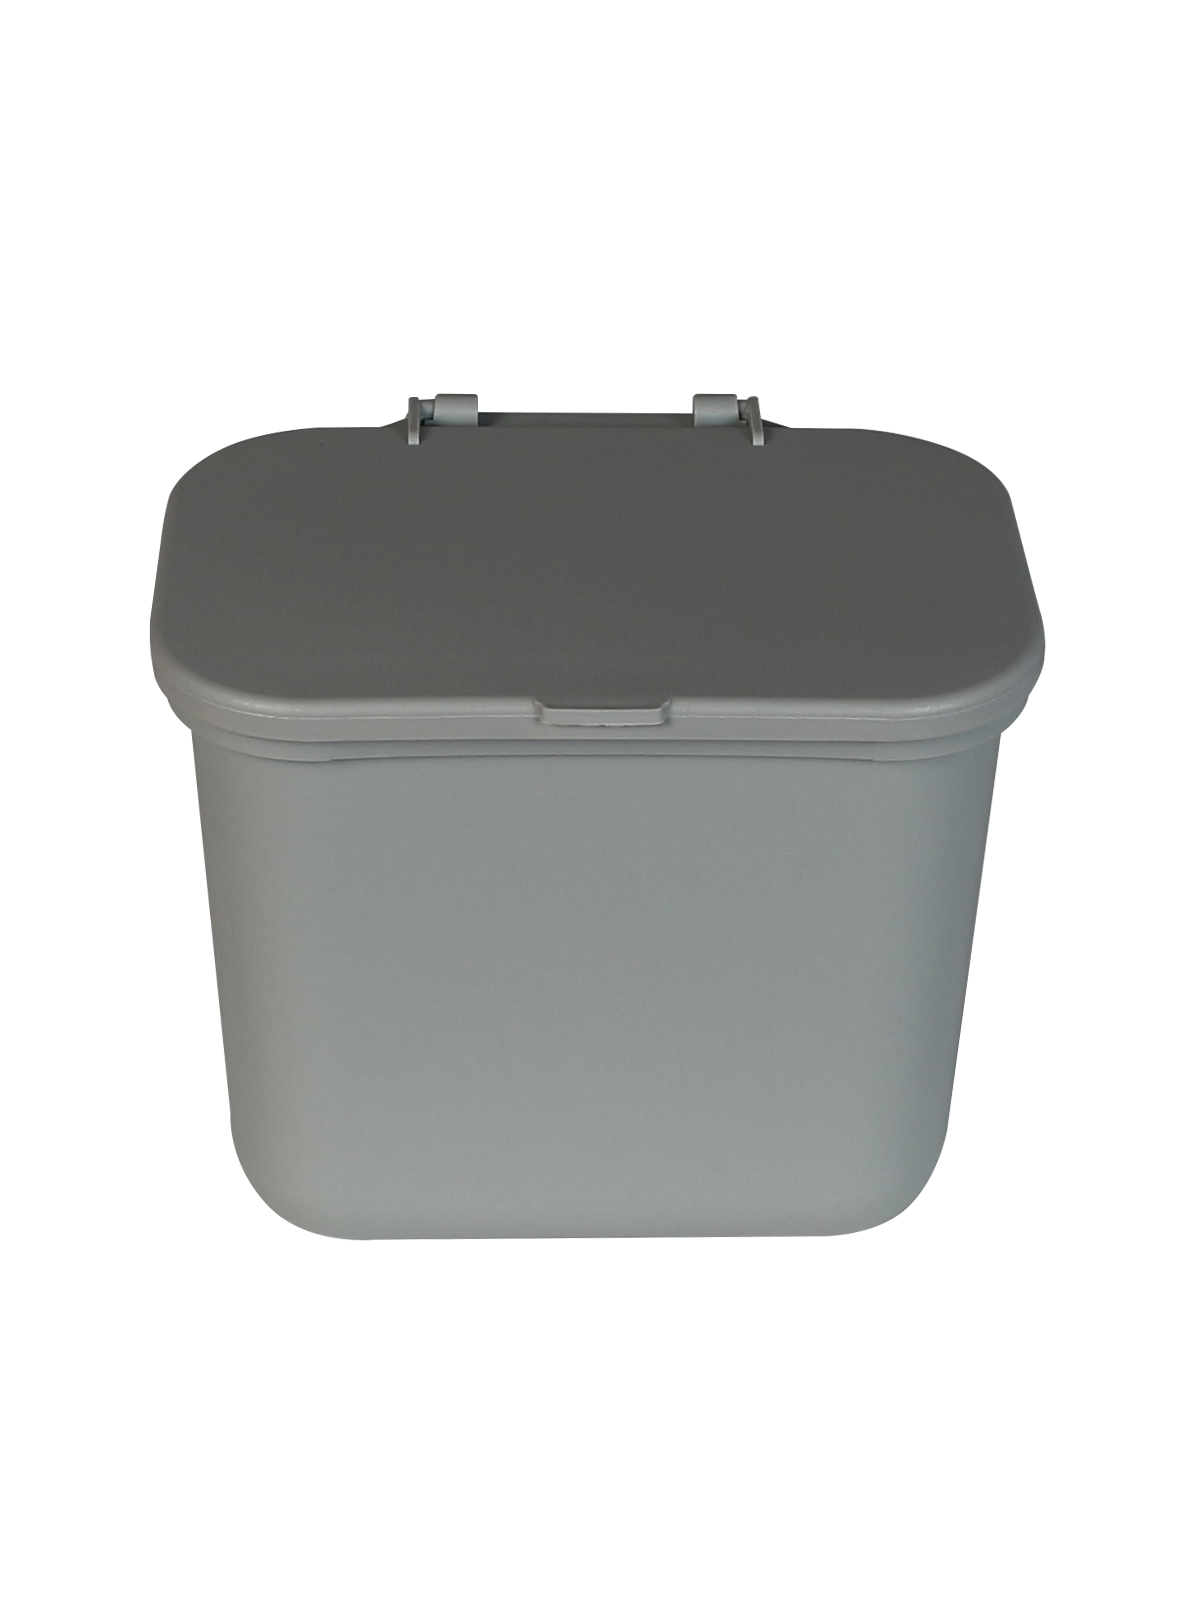 HANGING WASTE BASKET - Single - Solid Lift - Grey